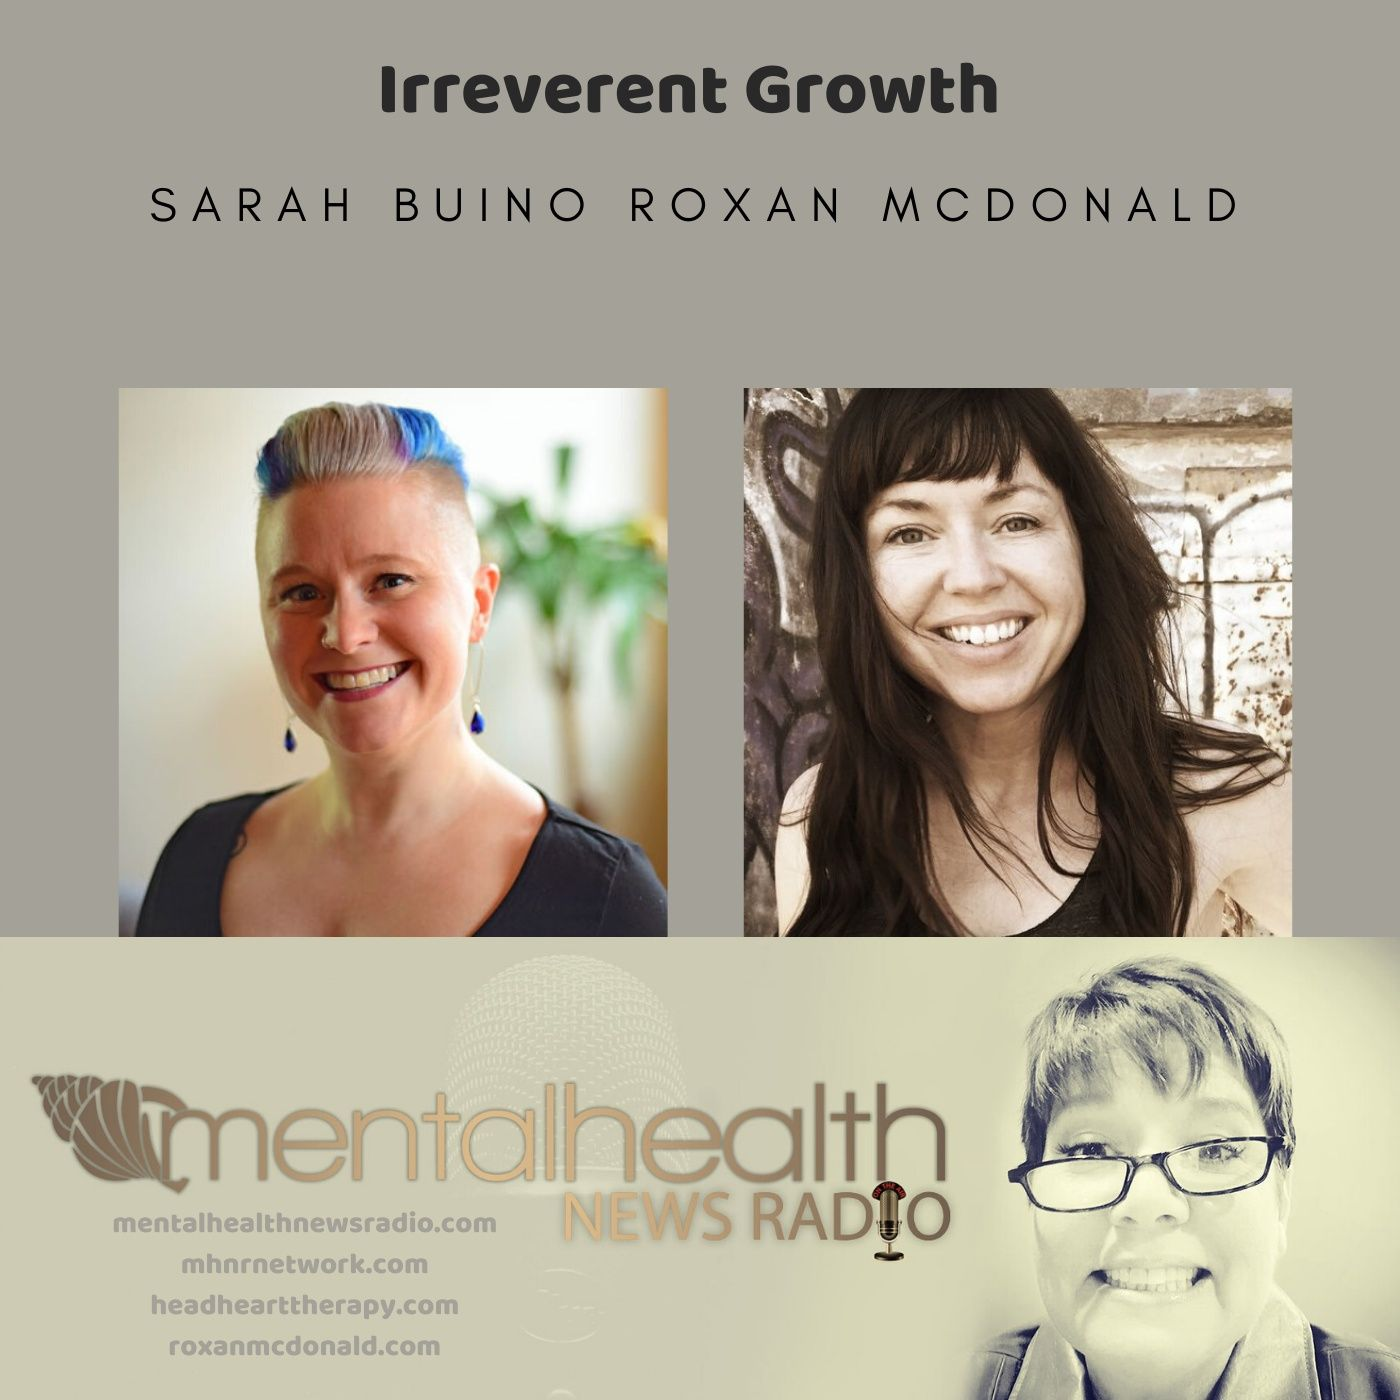 Mental Health News Radio - Irreverent Growth